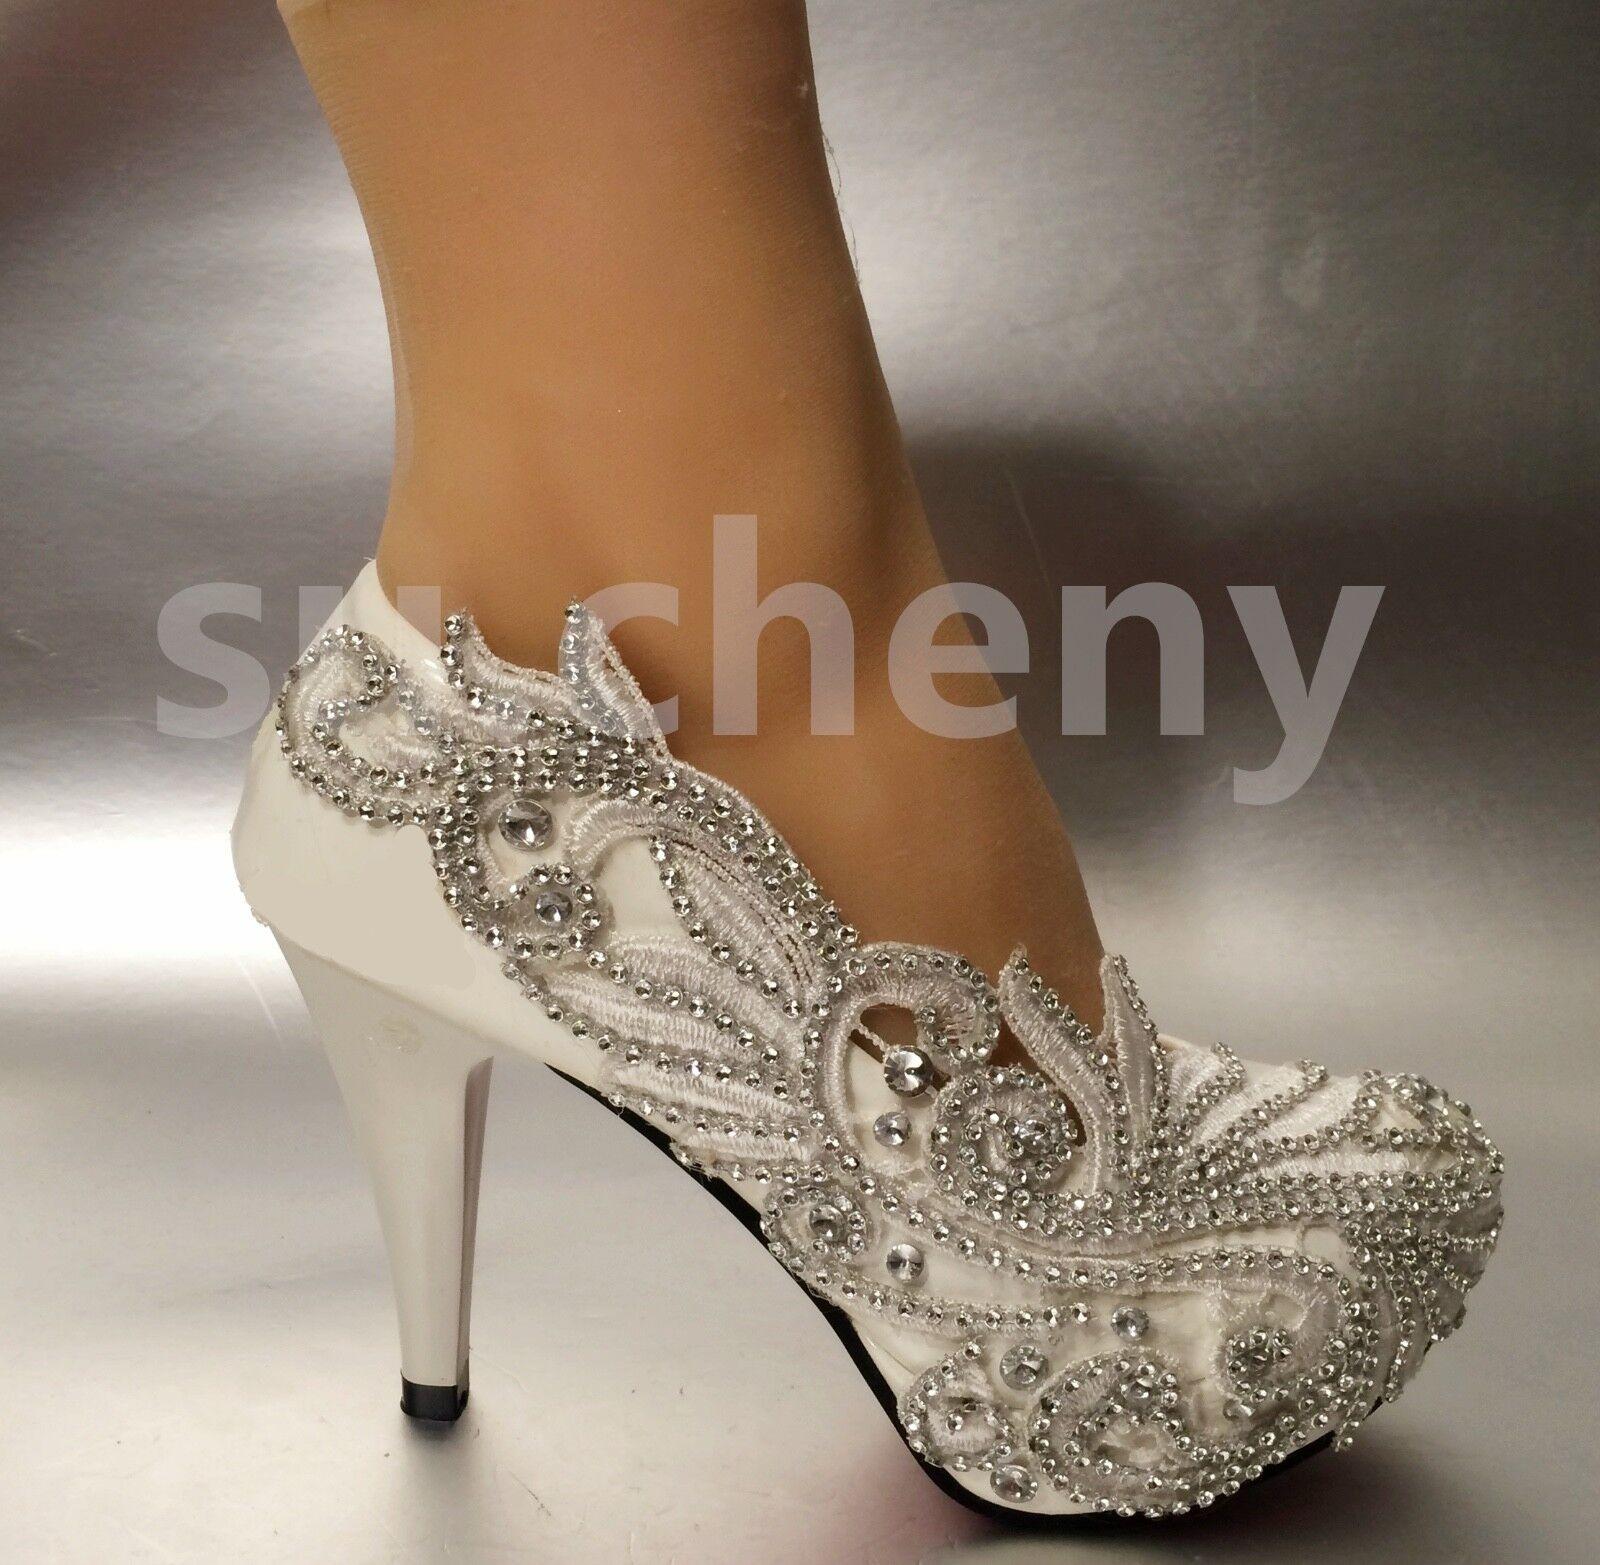 WEISS ivory crystal pumps Wedding schuhe Bridal high low wedges heels Größe 5-12